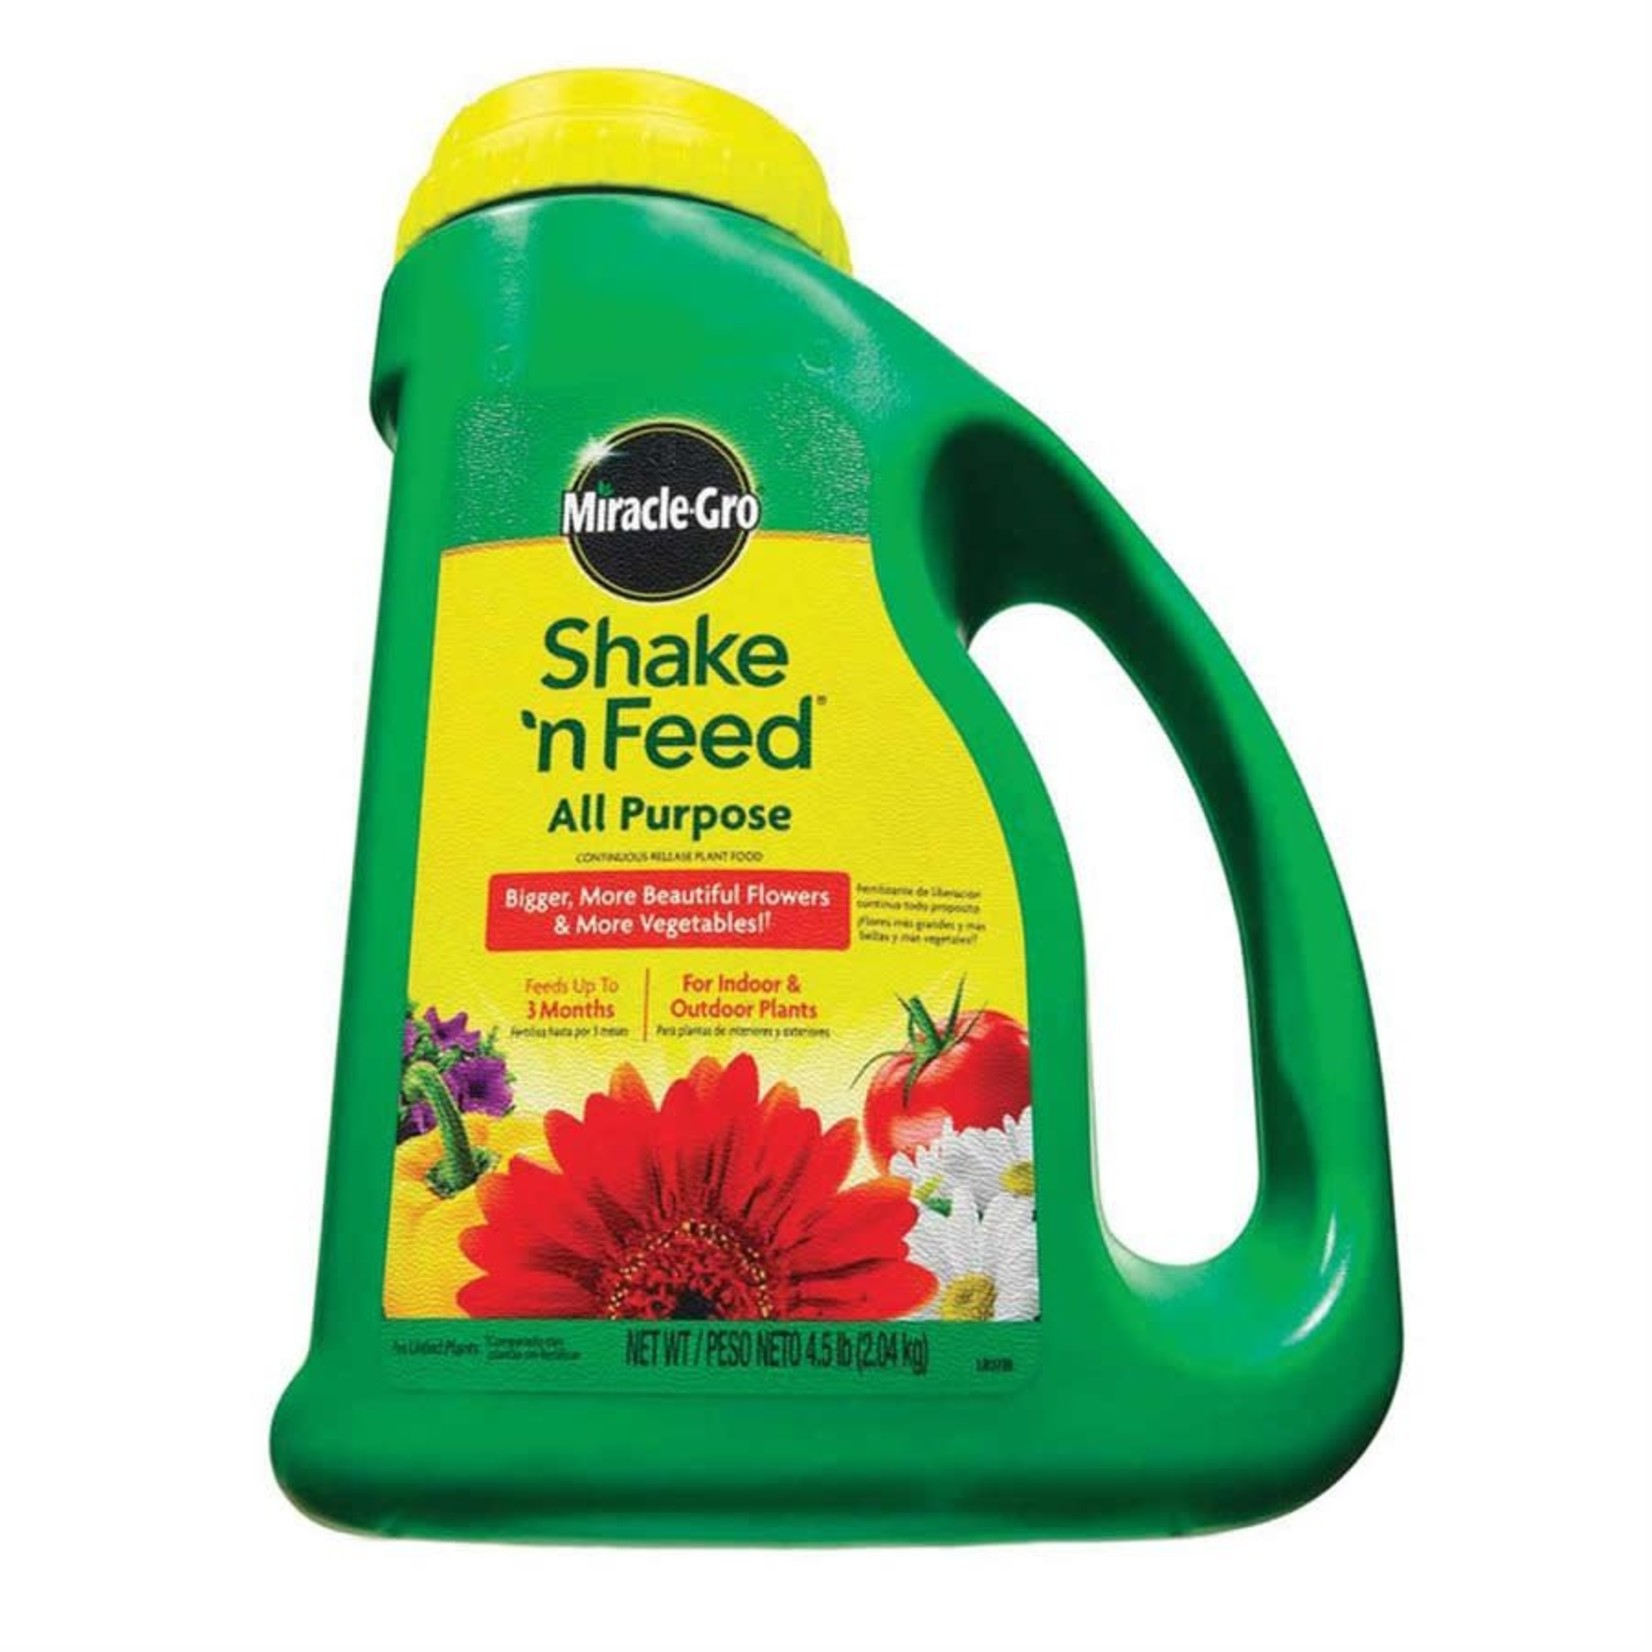 Miracle-Gro Shake 'n Feed All Purpose 2.04kg